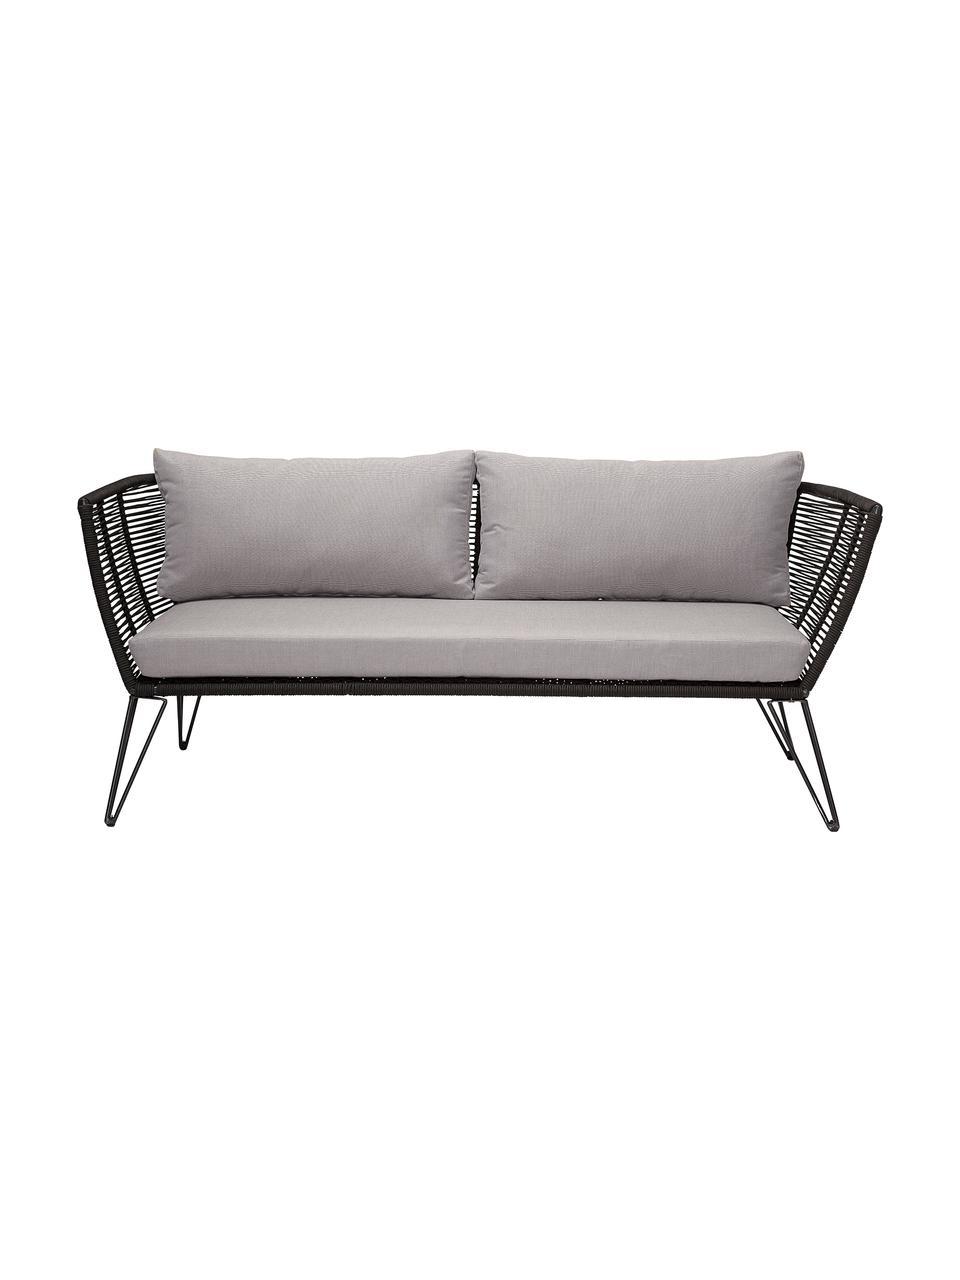 Canapé lounge jardin plastique tressé Mundo, Beige